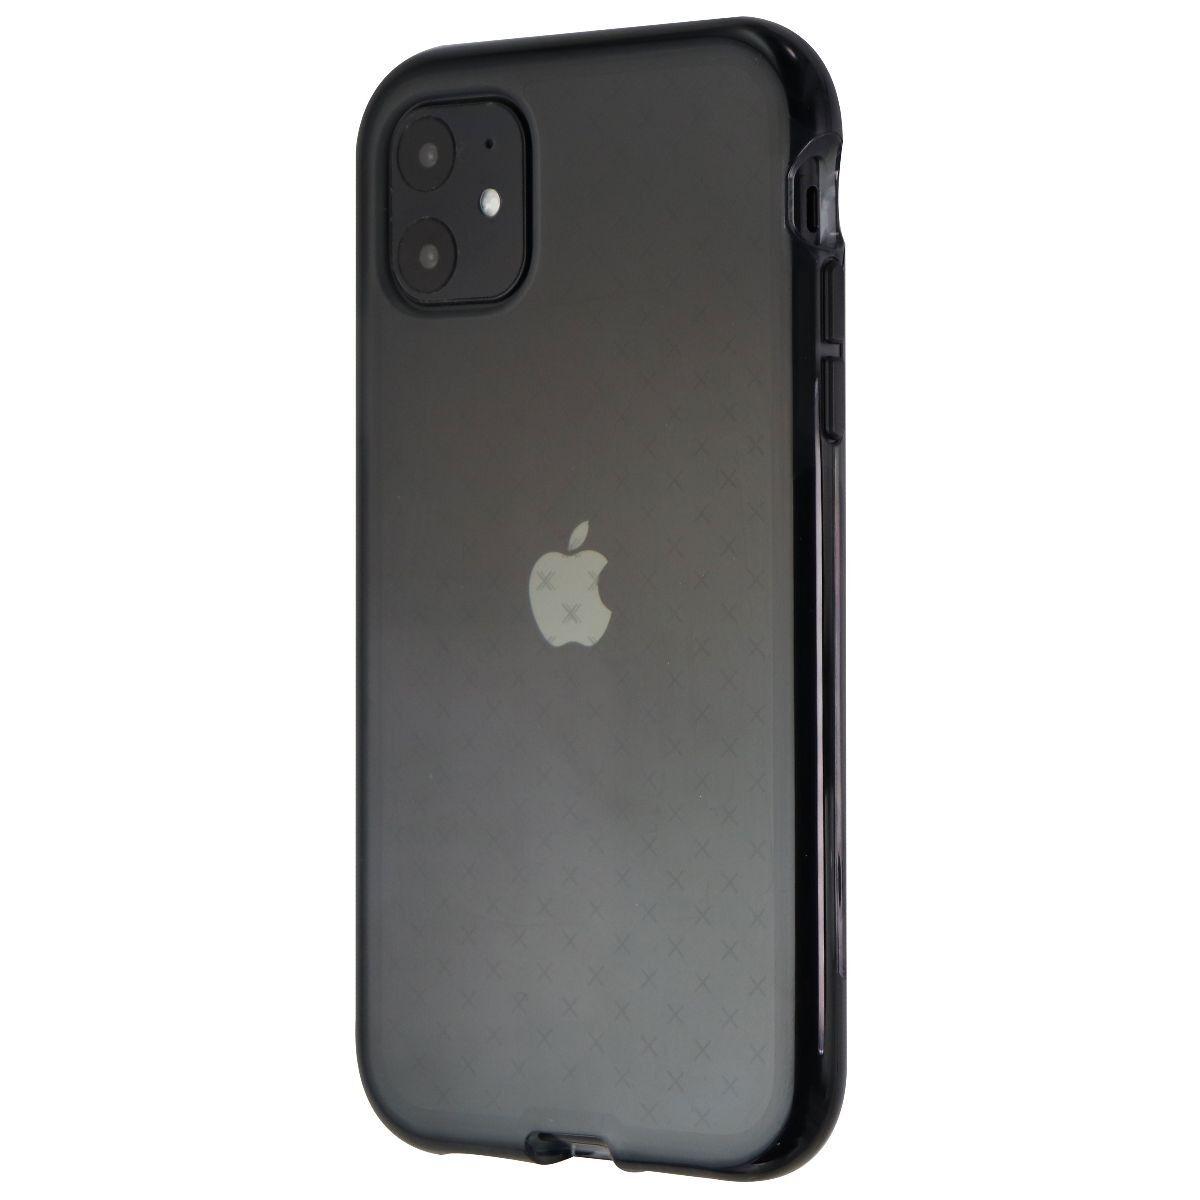 Tech21 Evo Check Series Gel Case for Apple iPhone 11 Smartphones - Smokey Black